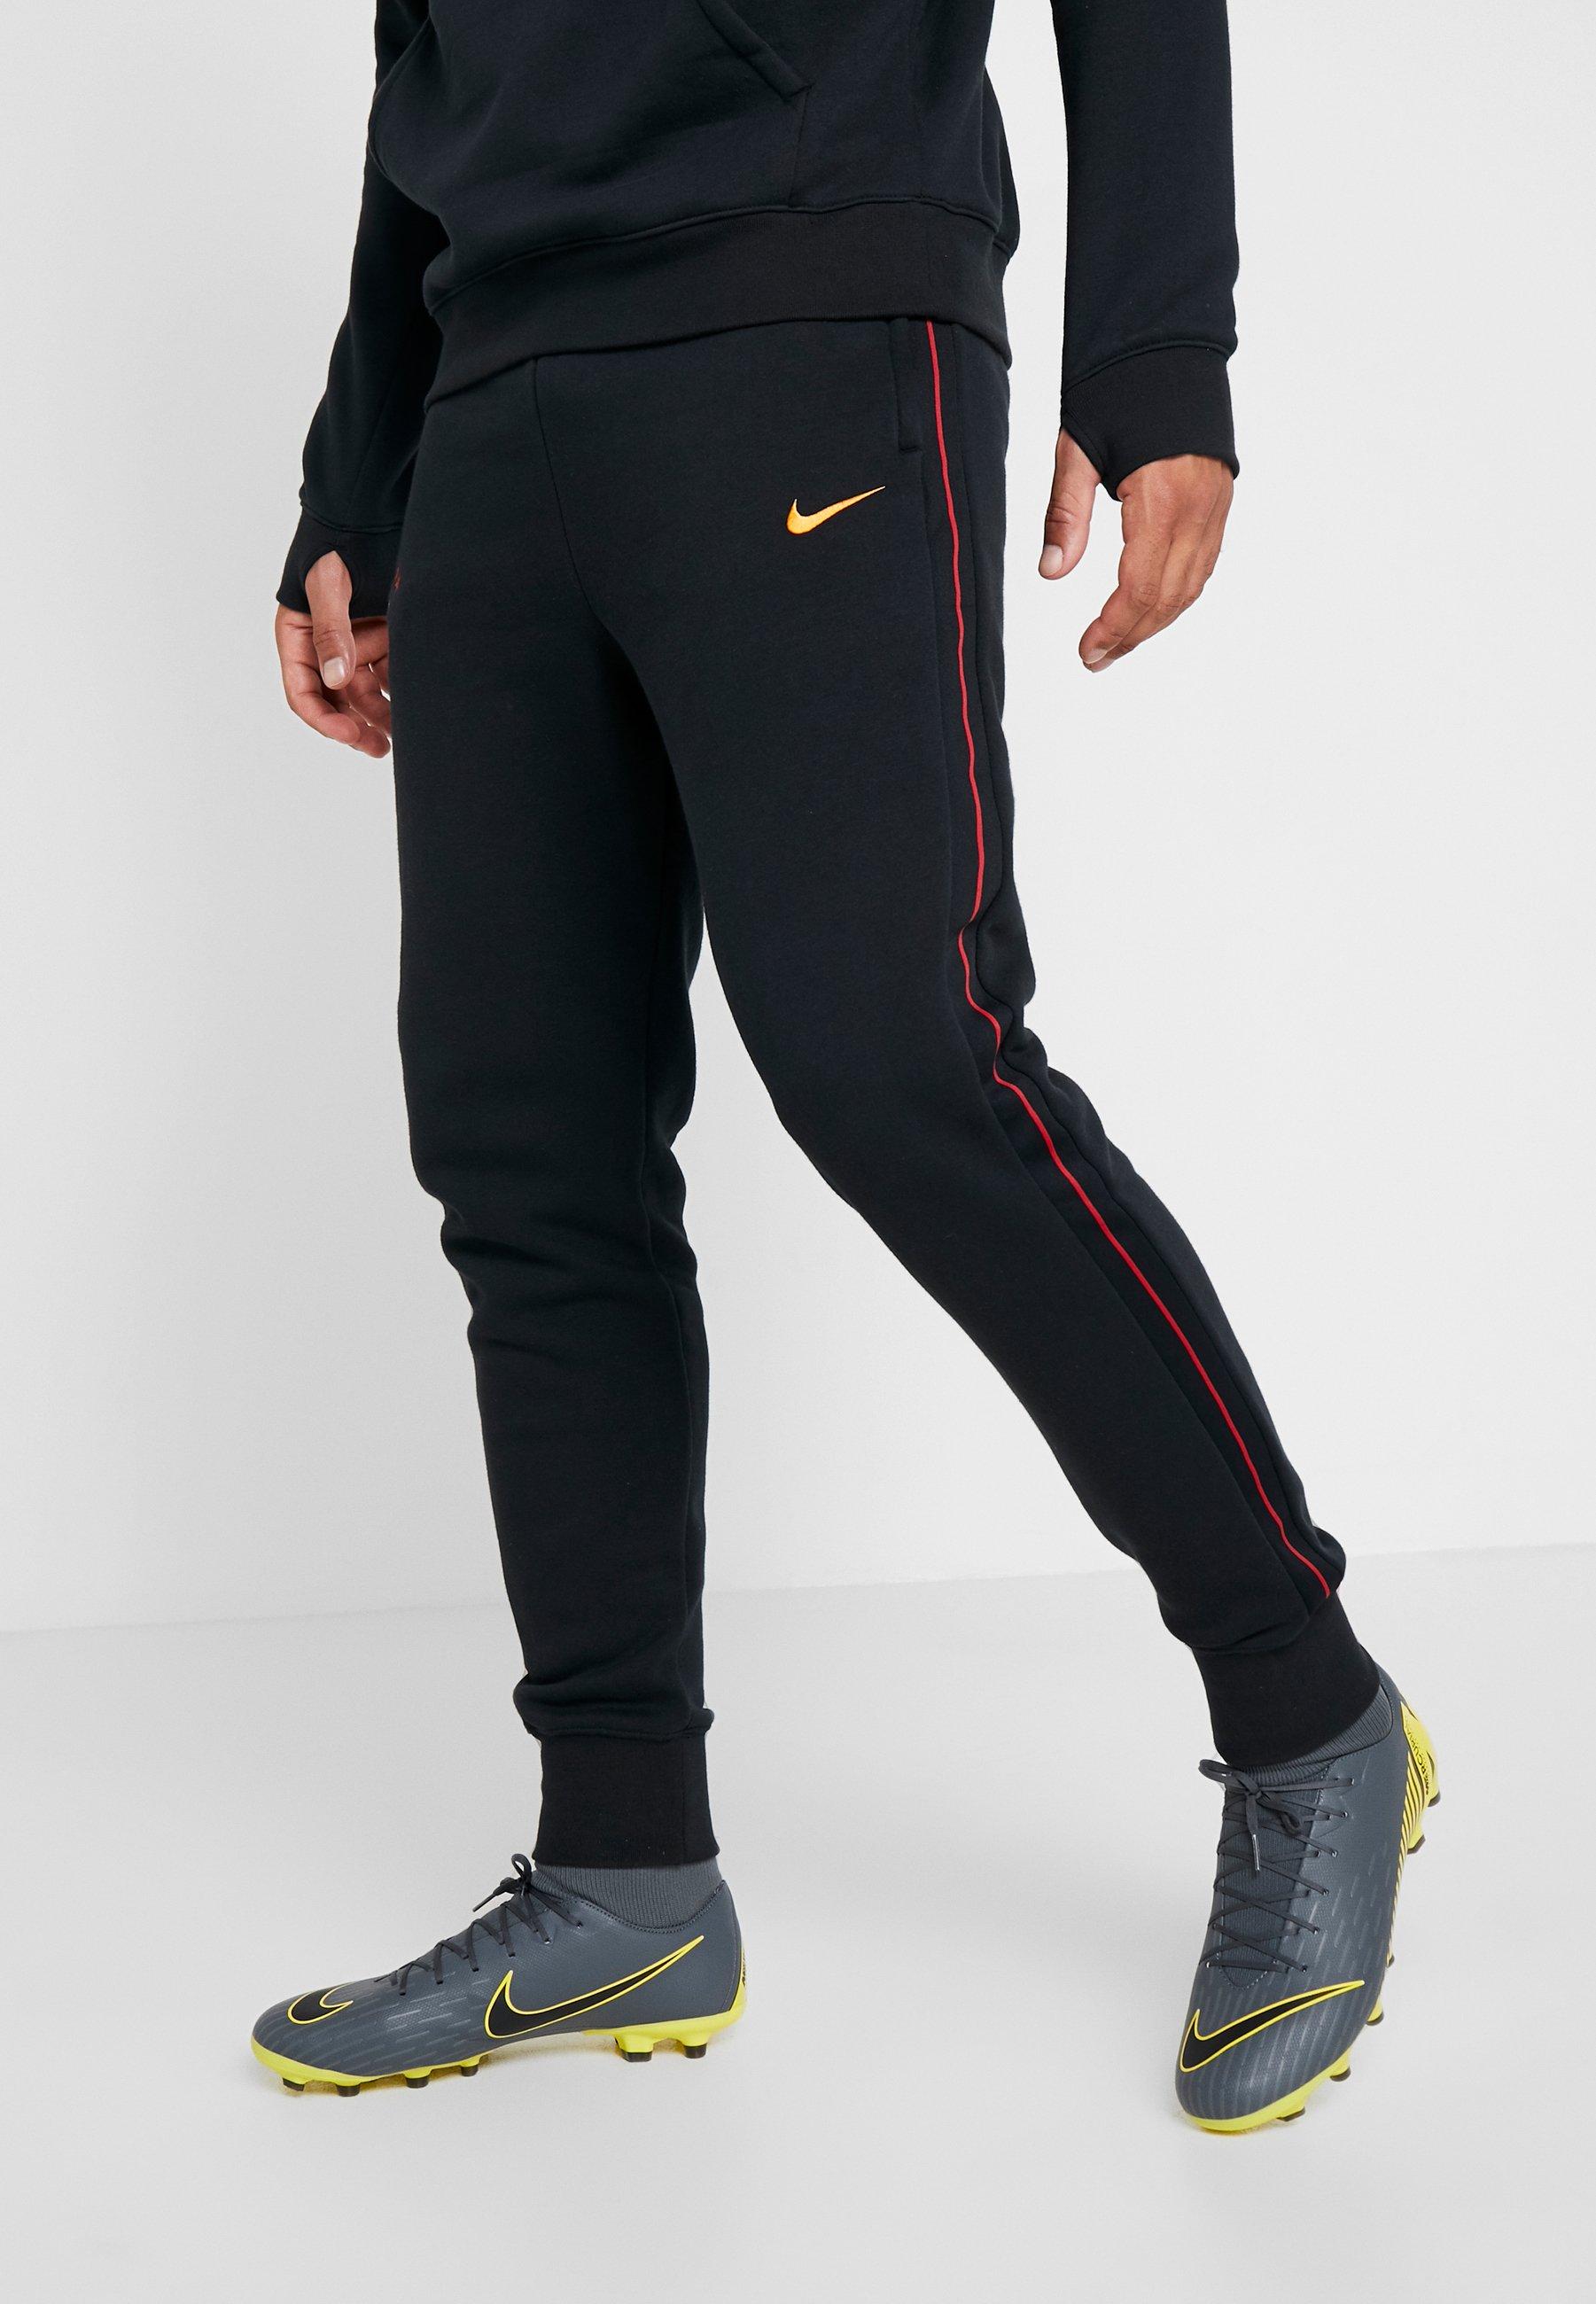 De Nike pepper Red Galatasaray Orange PantArticle Black Supporter Performance vivid Istanbul ikXuOPZ